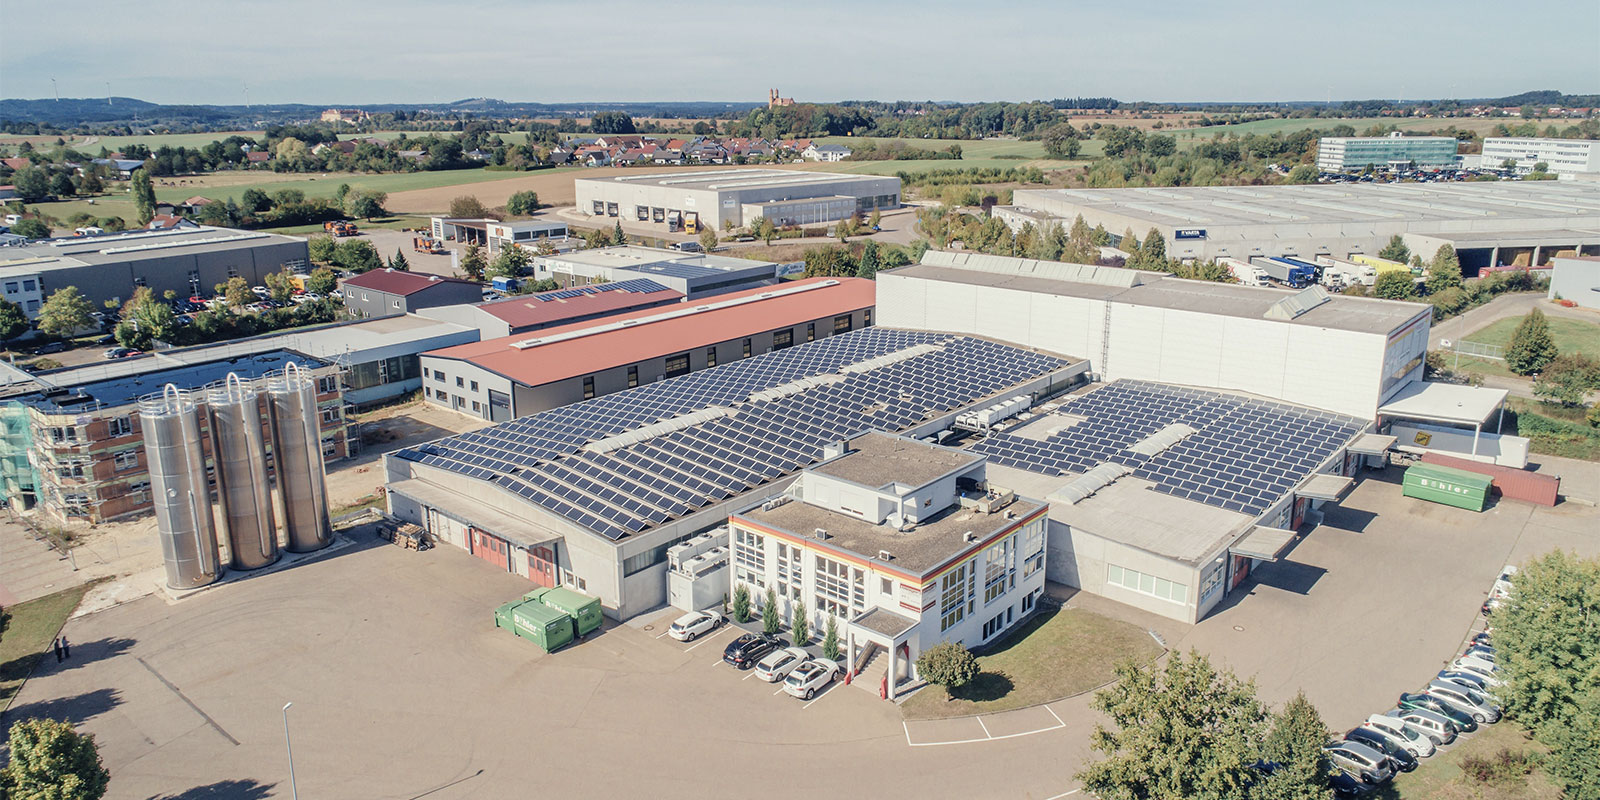 Verpackungsunternehmen-Mezger-Bilder-September-2018-172